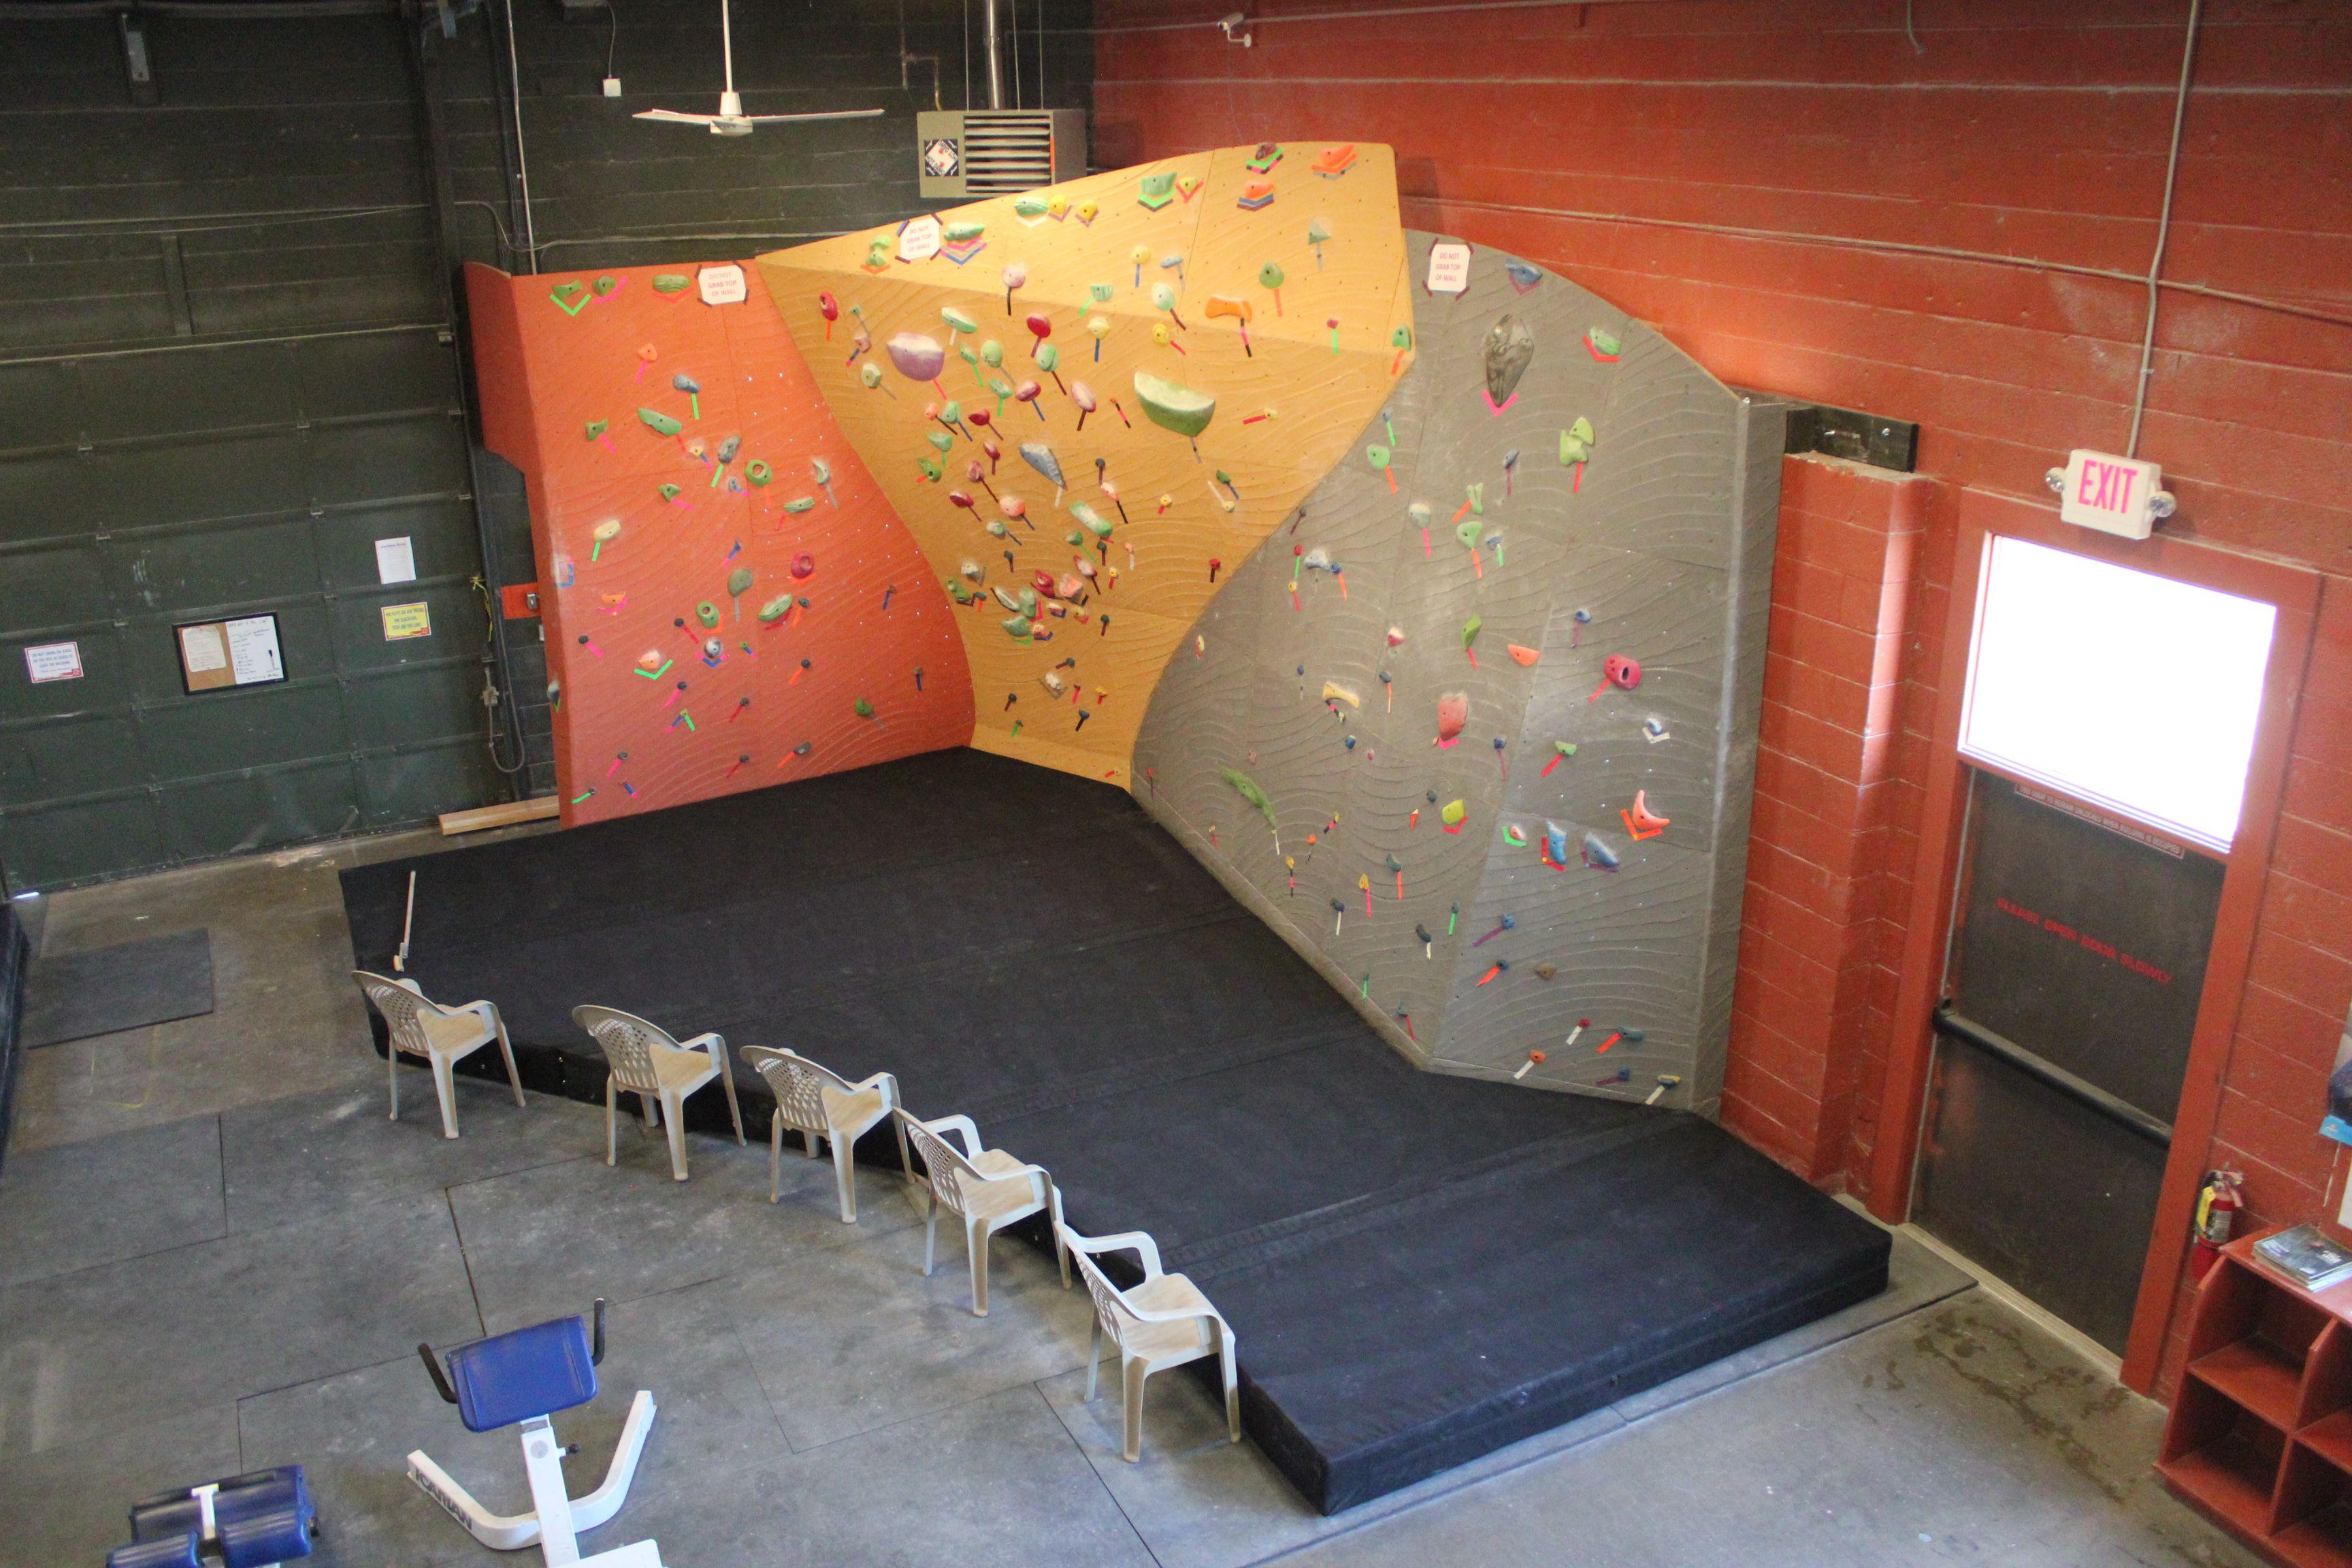 Asana climbing gym boise id walls by elevate